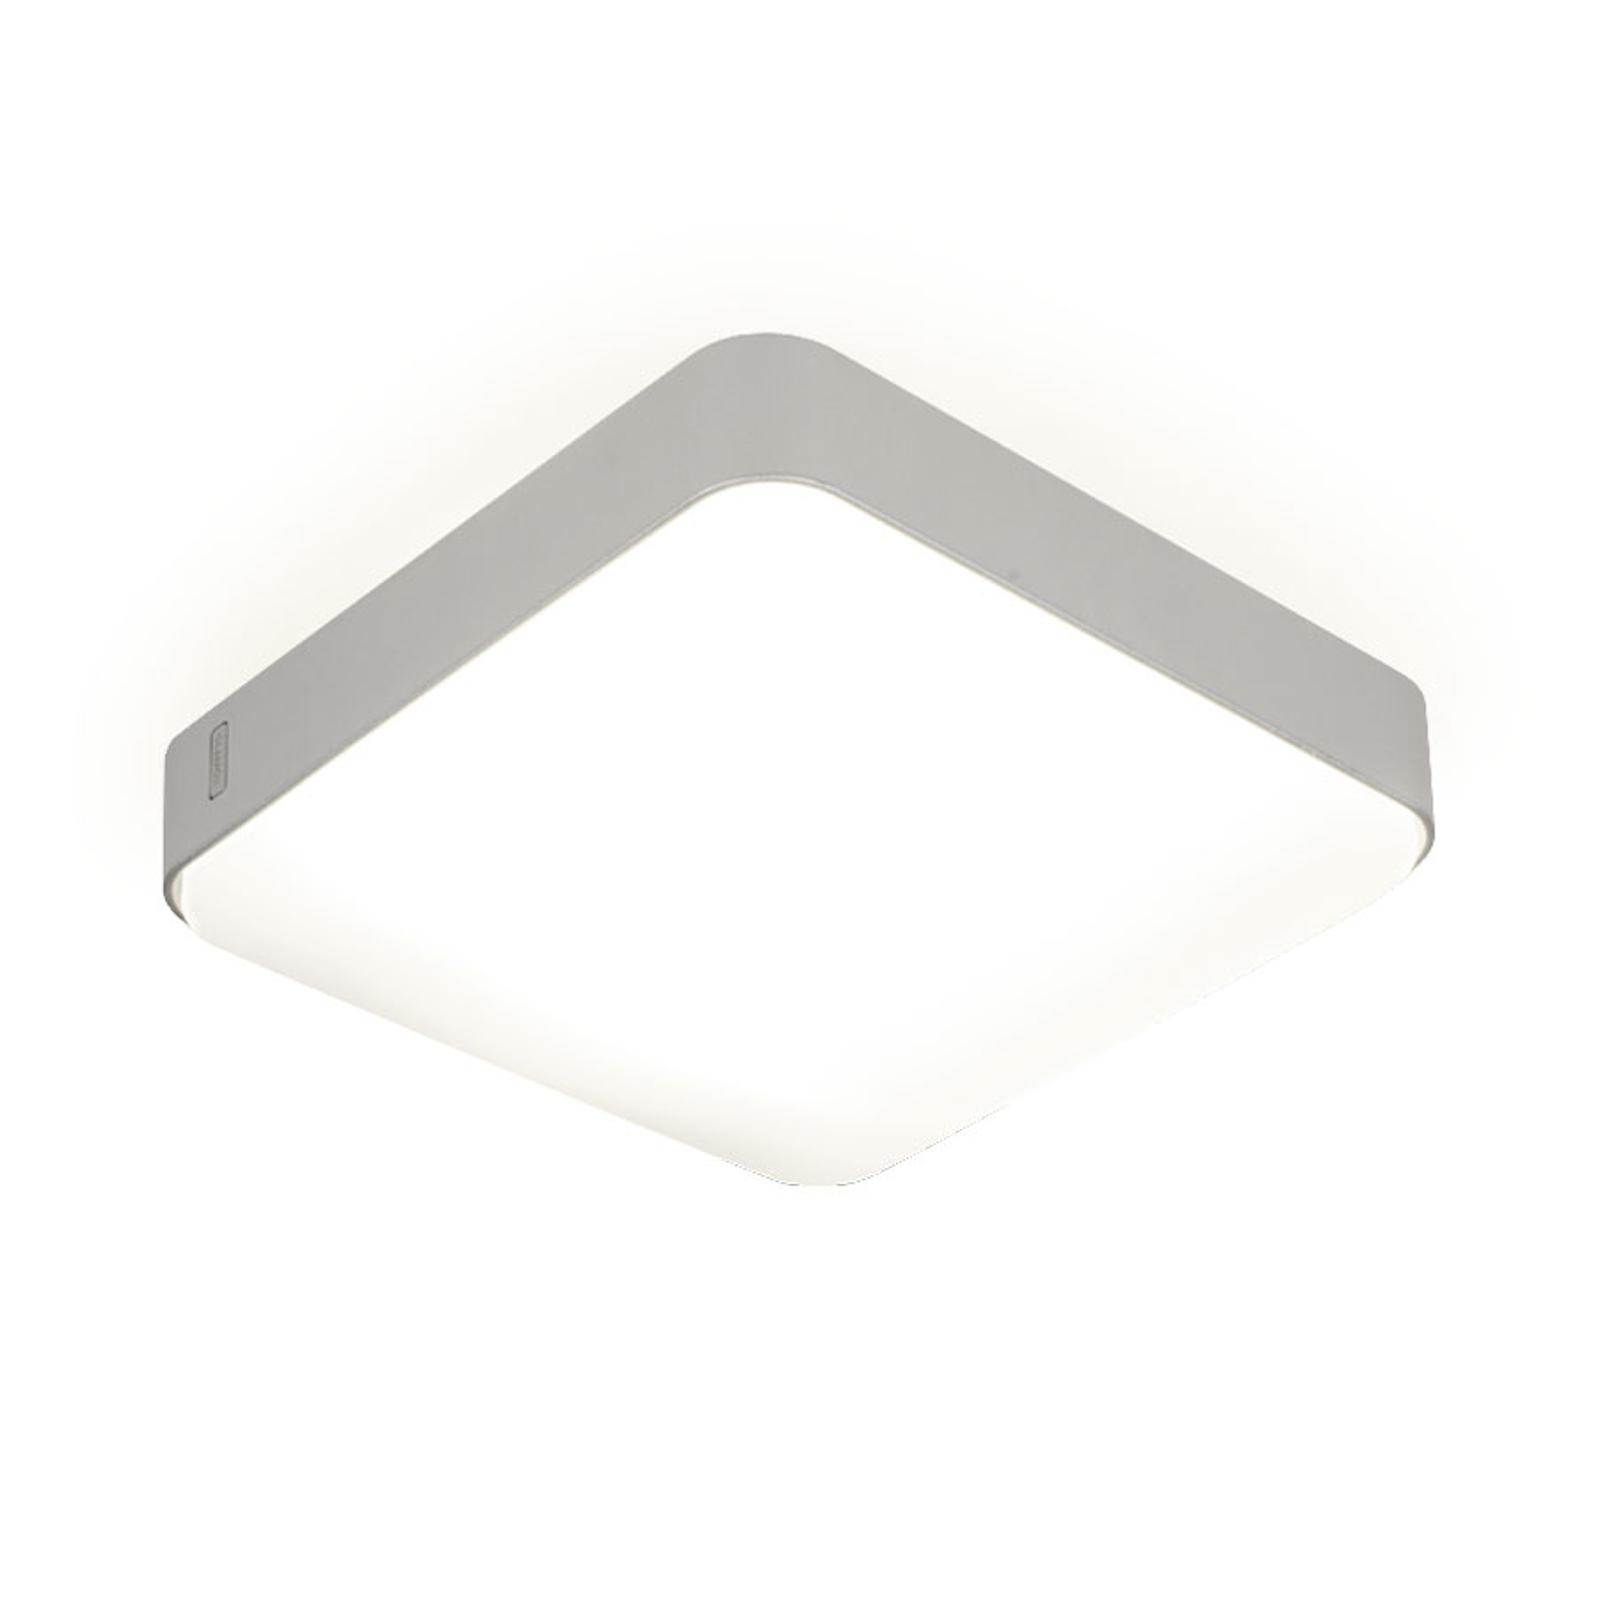 A20-SQ LED-taklampe, 30x30 cm, 3 000 K